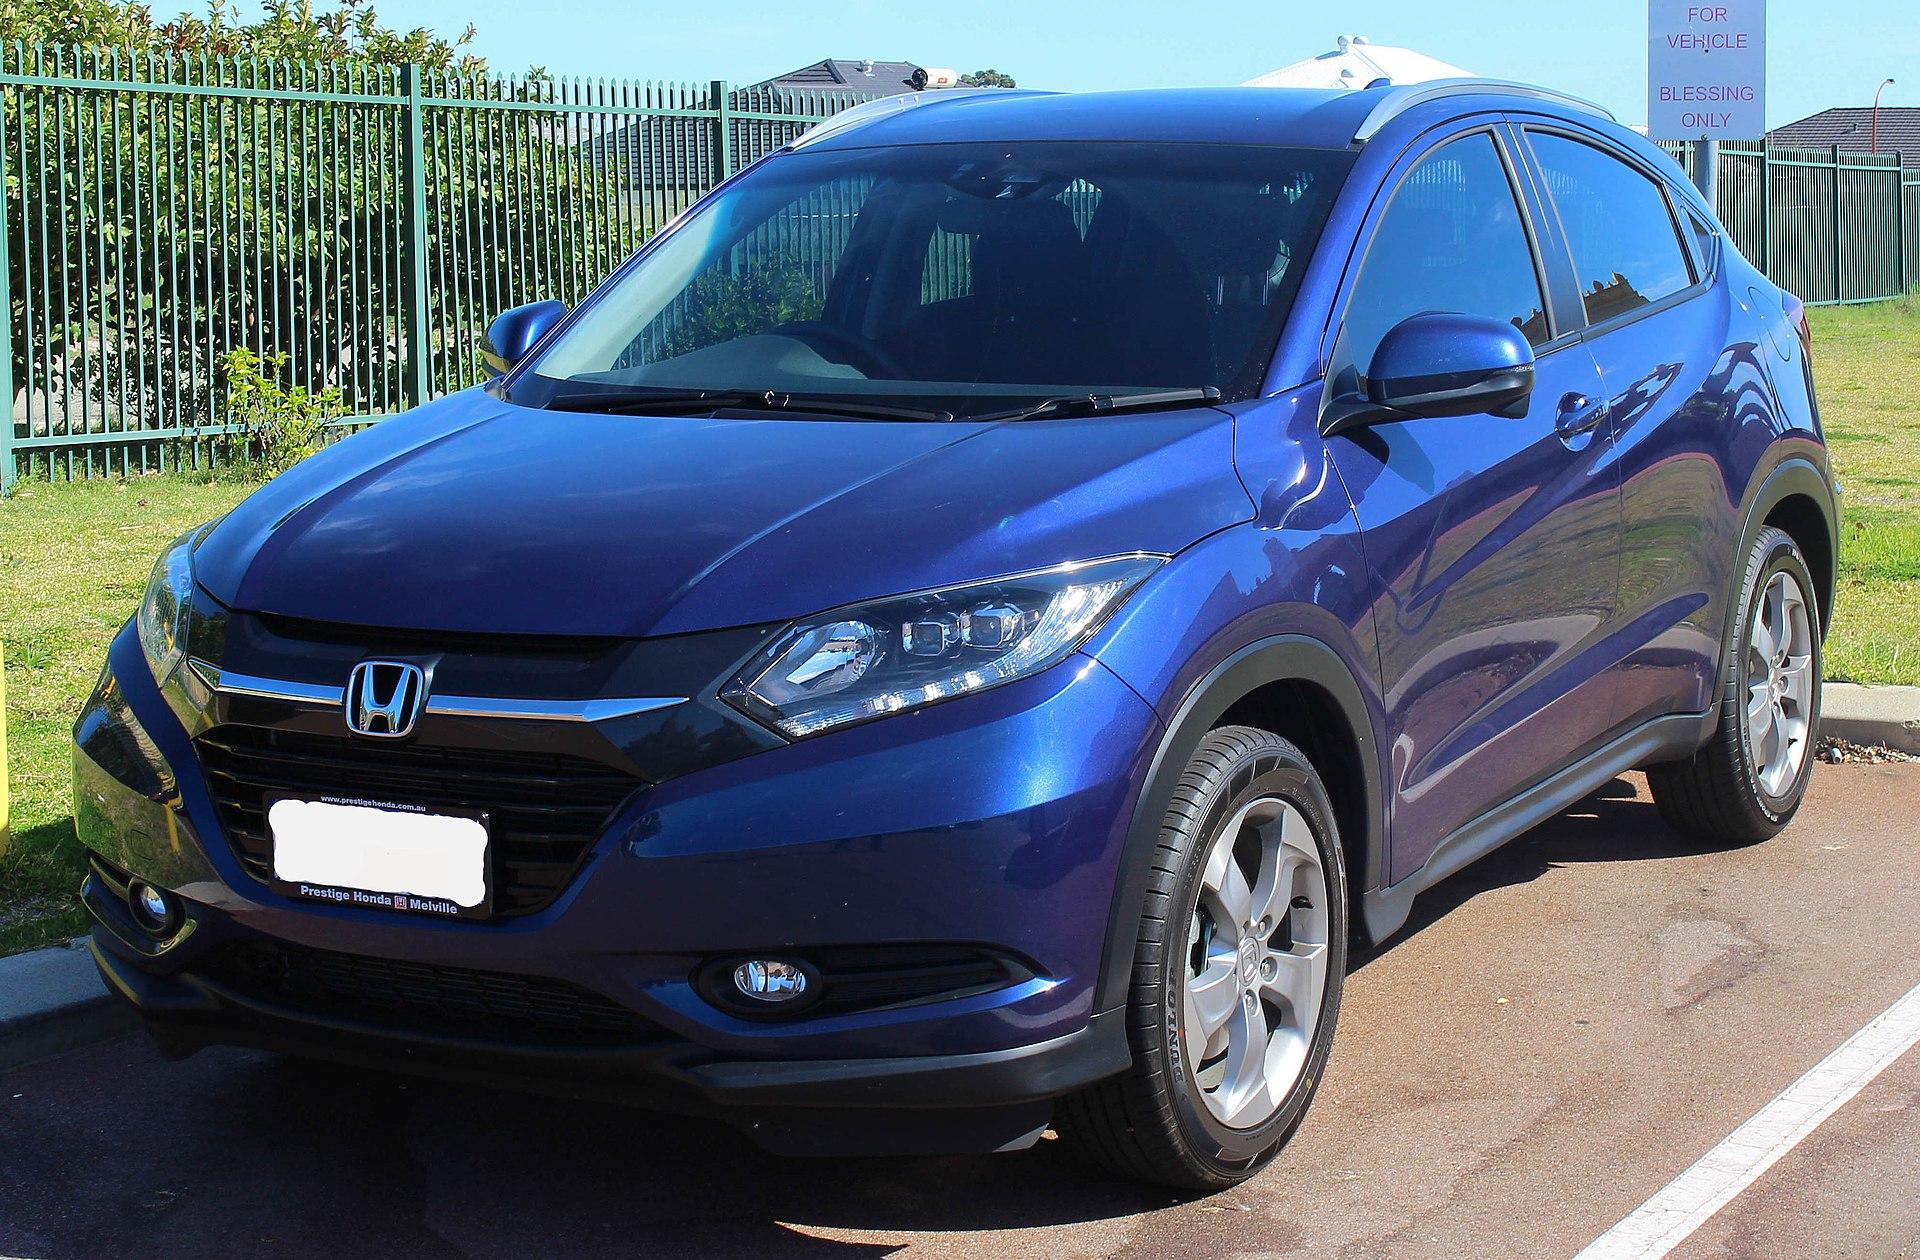 2015 Honda HR-V (MY15) VTi-S wagon (2015-04-25).JPG